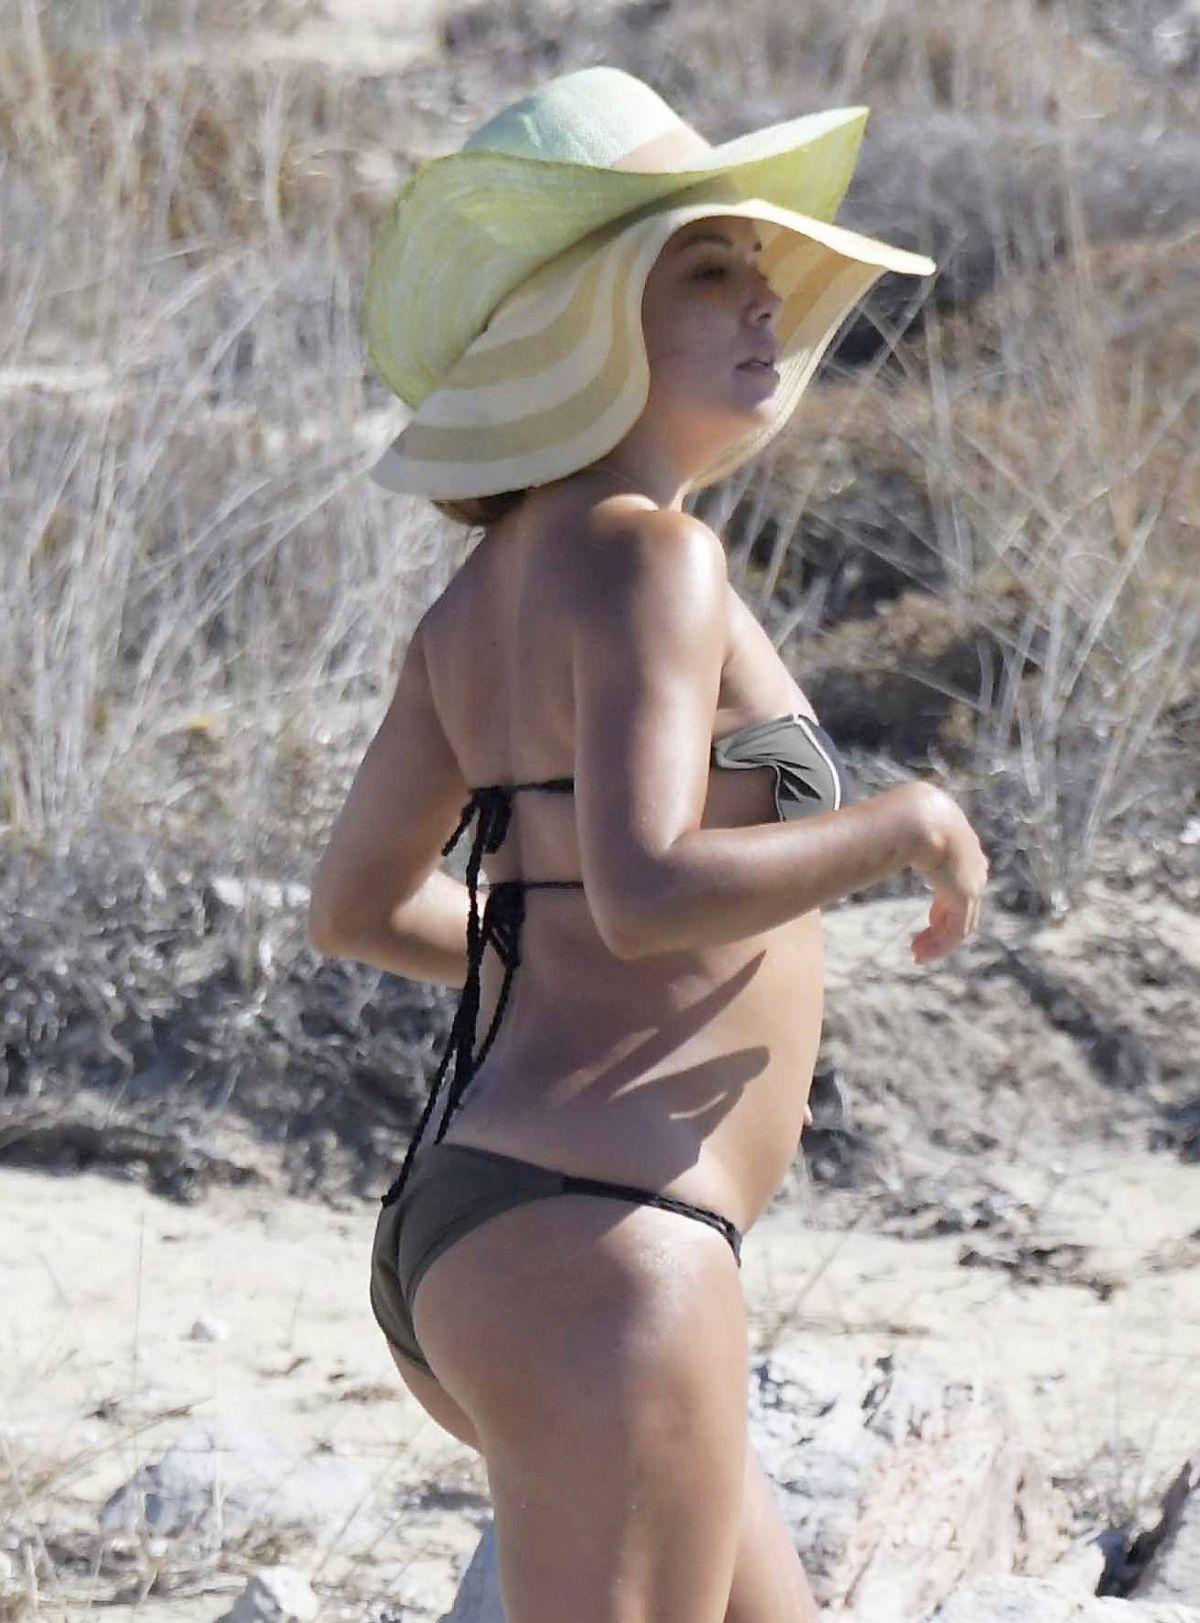 Eva longoria bikini candids beach in delos greece naked (27 photos), Topless Celebrity image